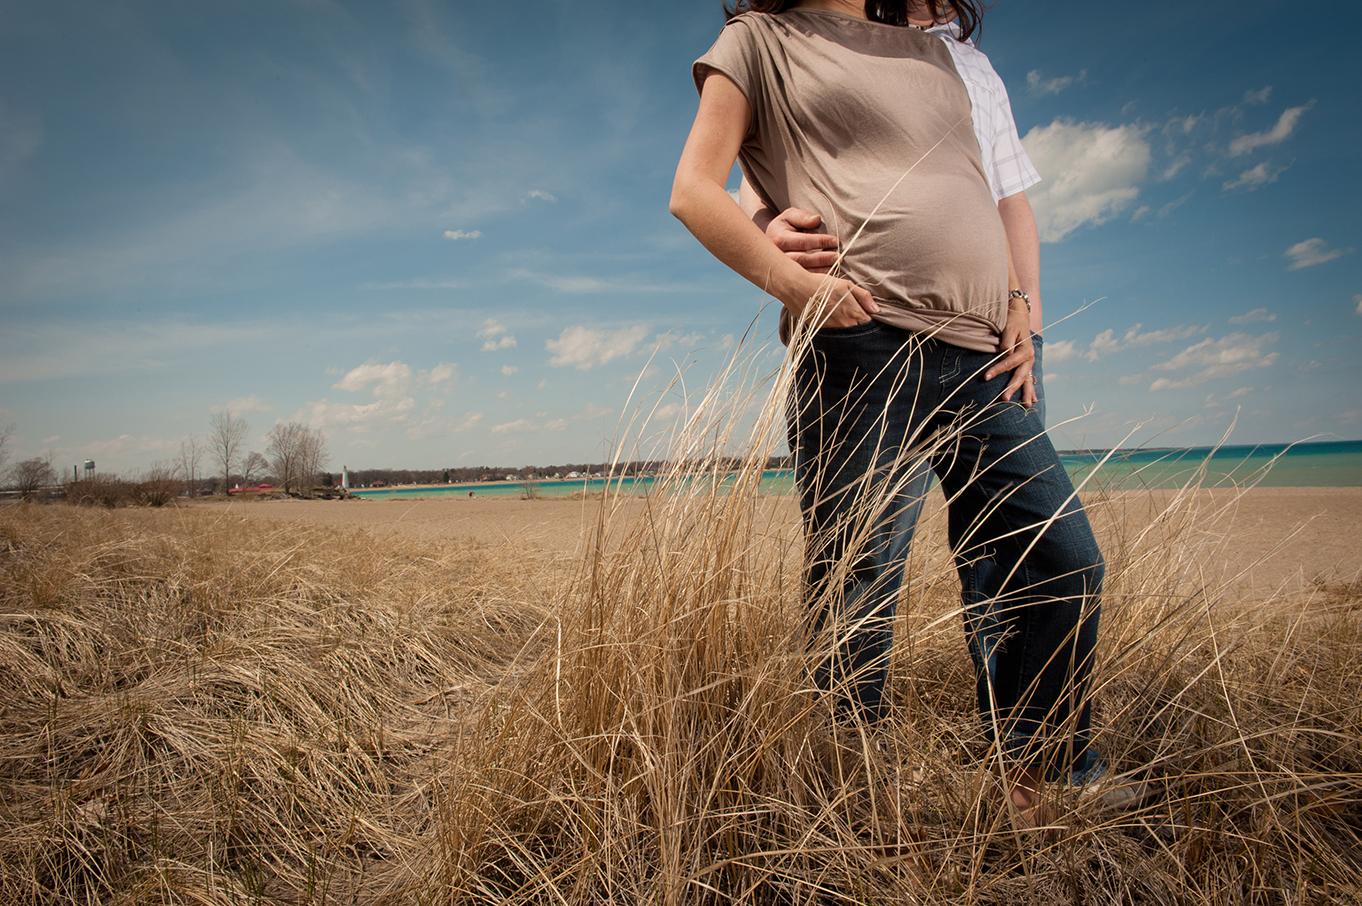 Dunlop_Maternity-12.jpg